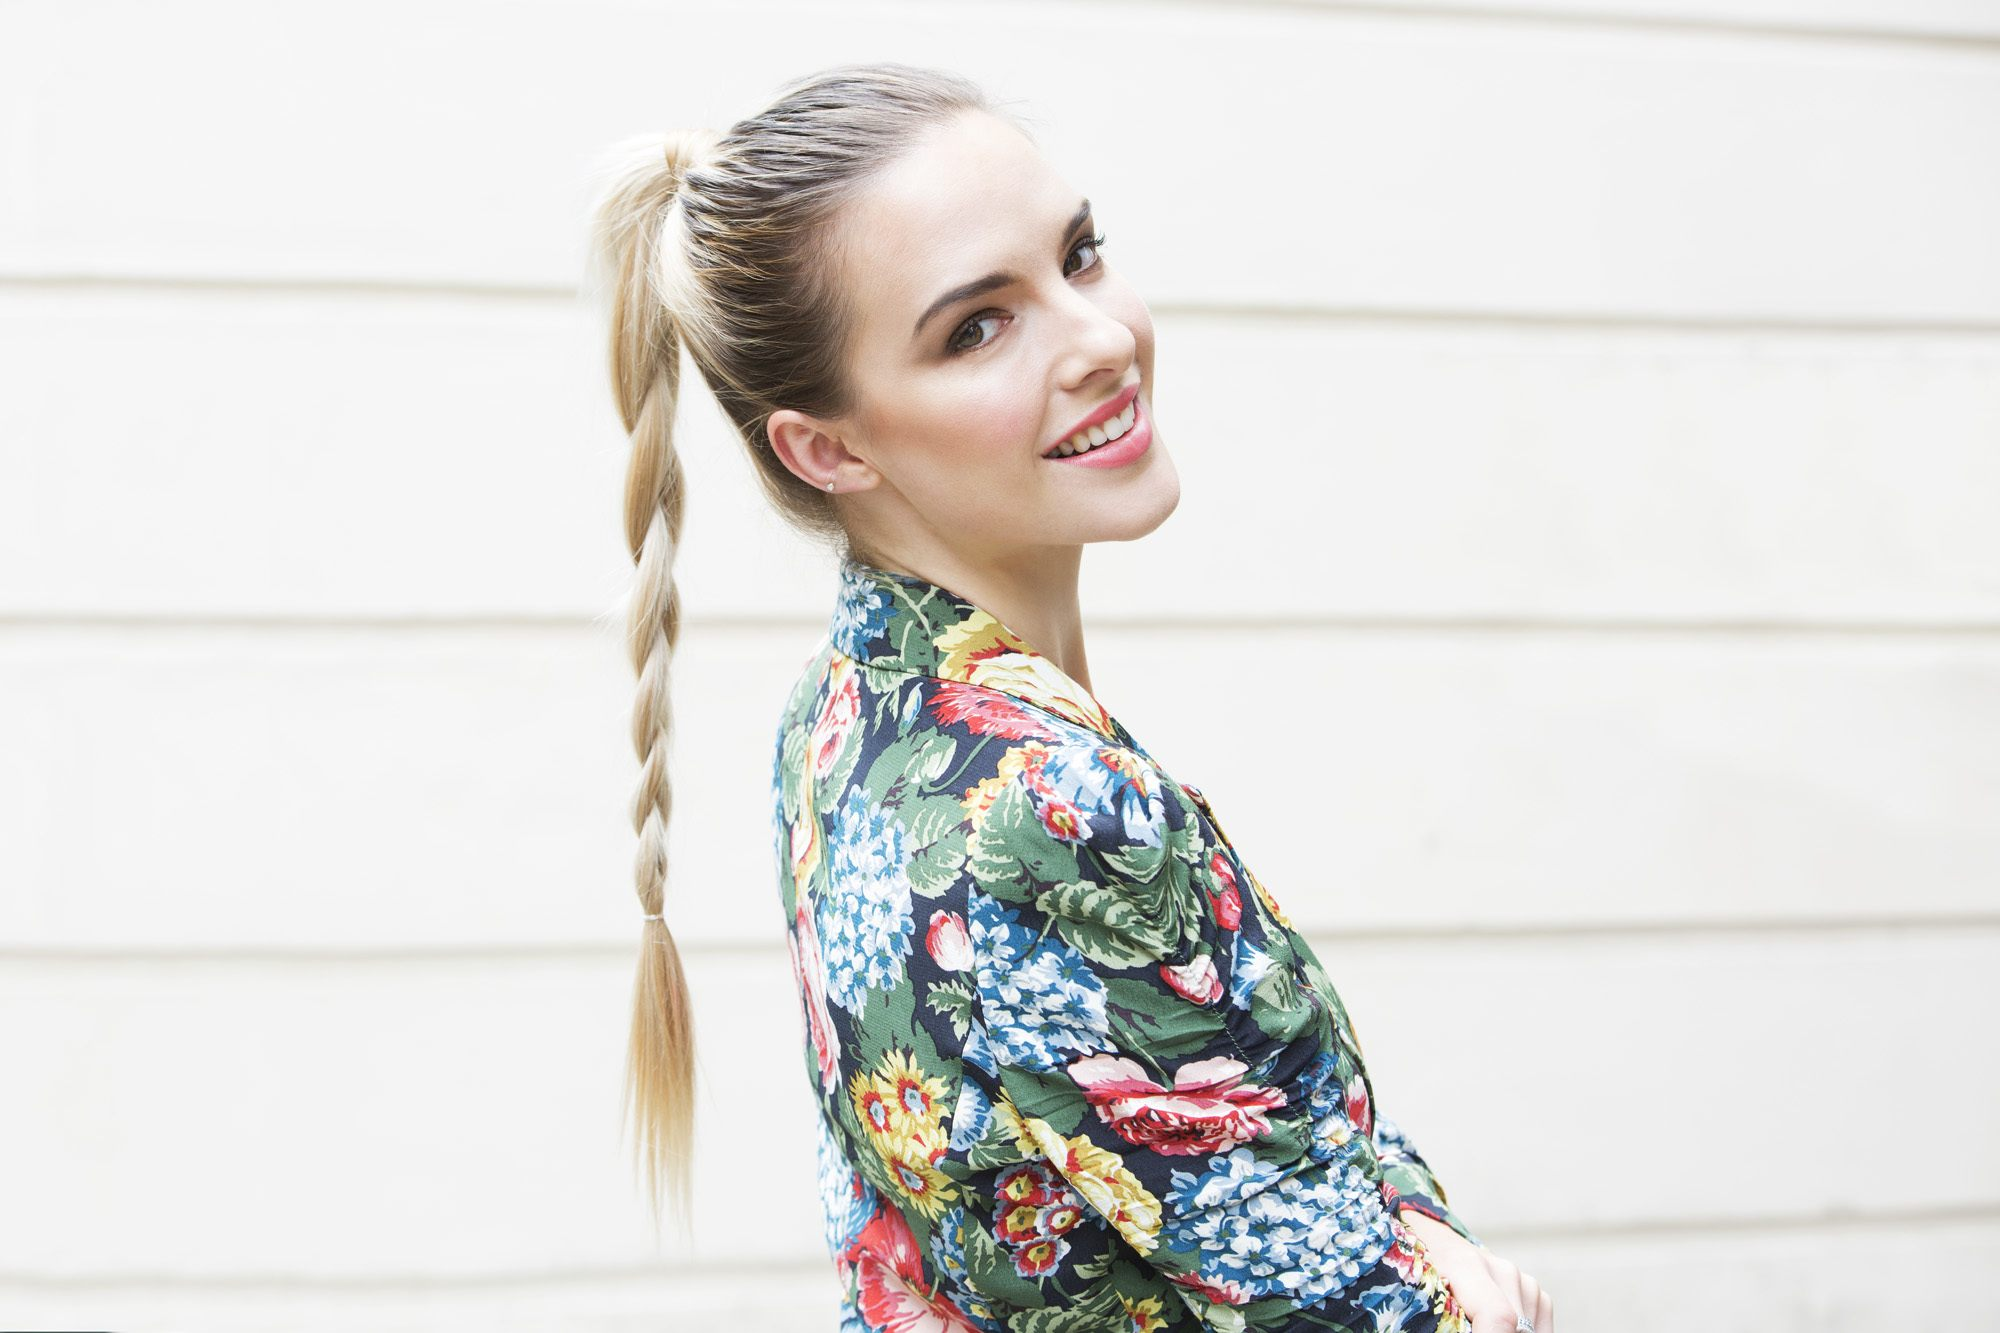 Model rambut braided ponytail pada wanita.